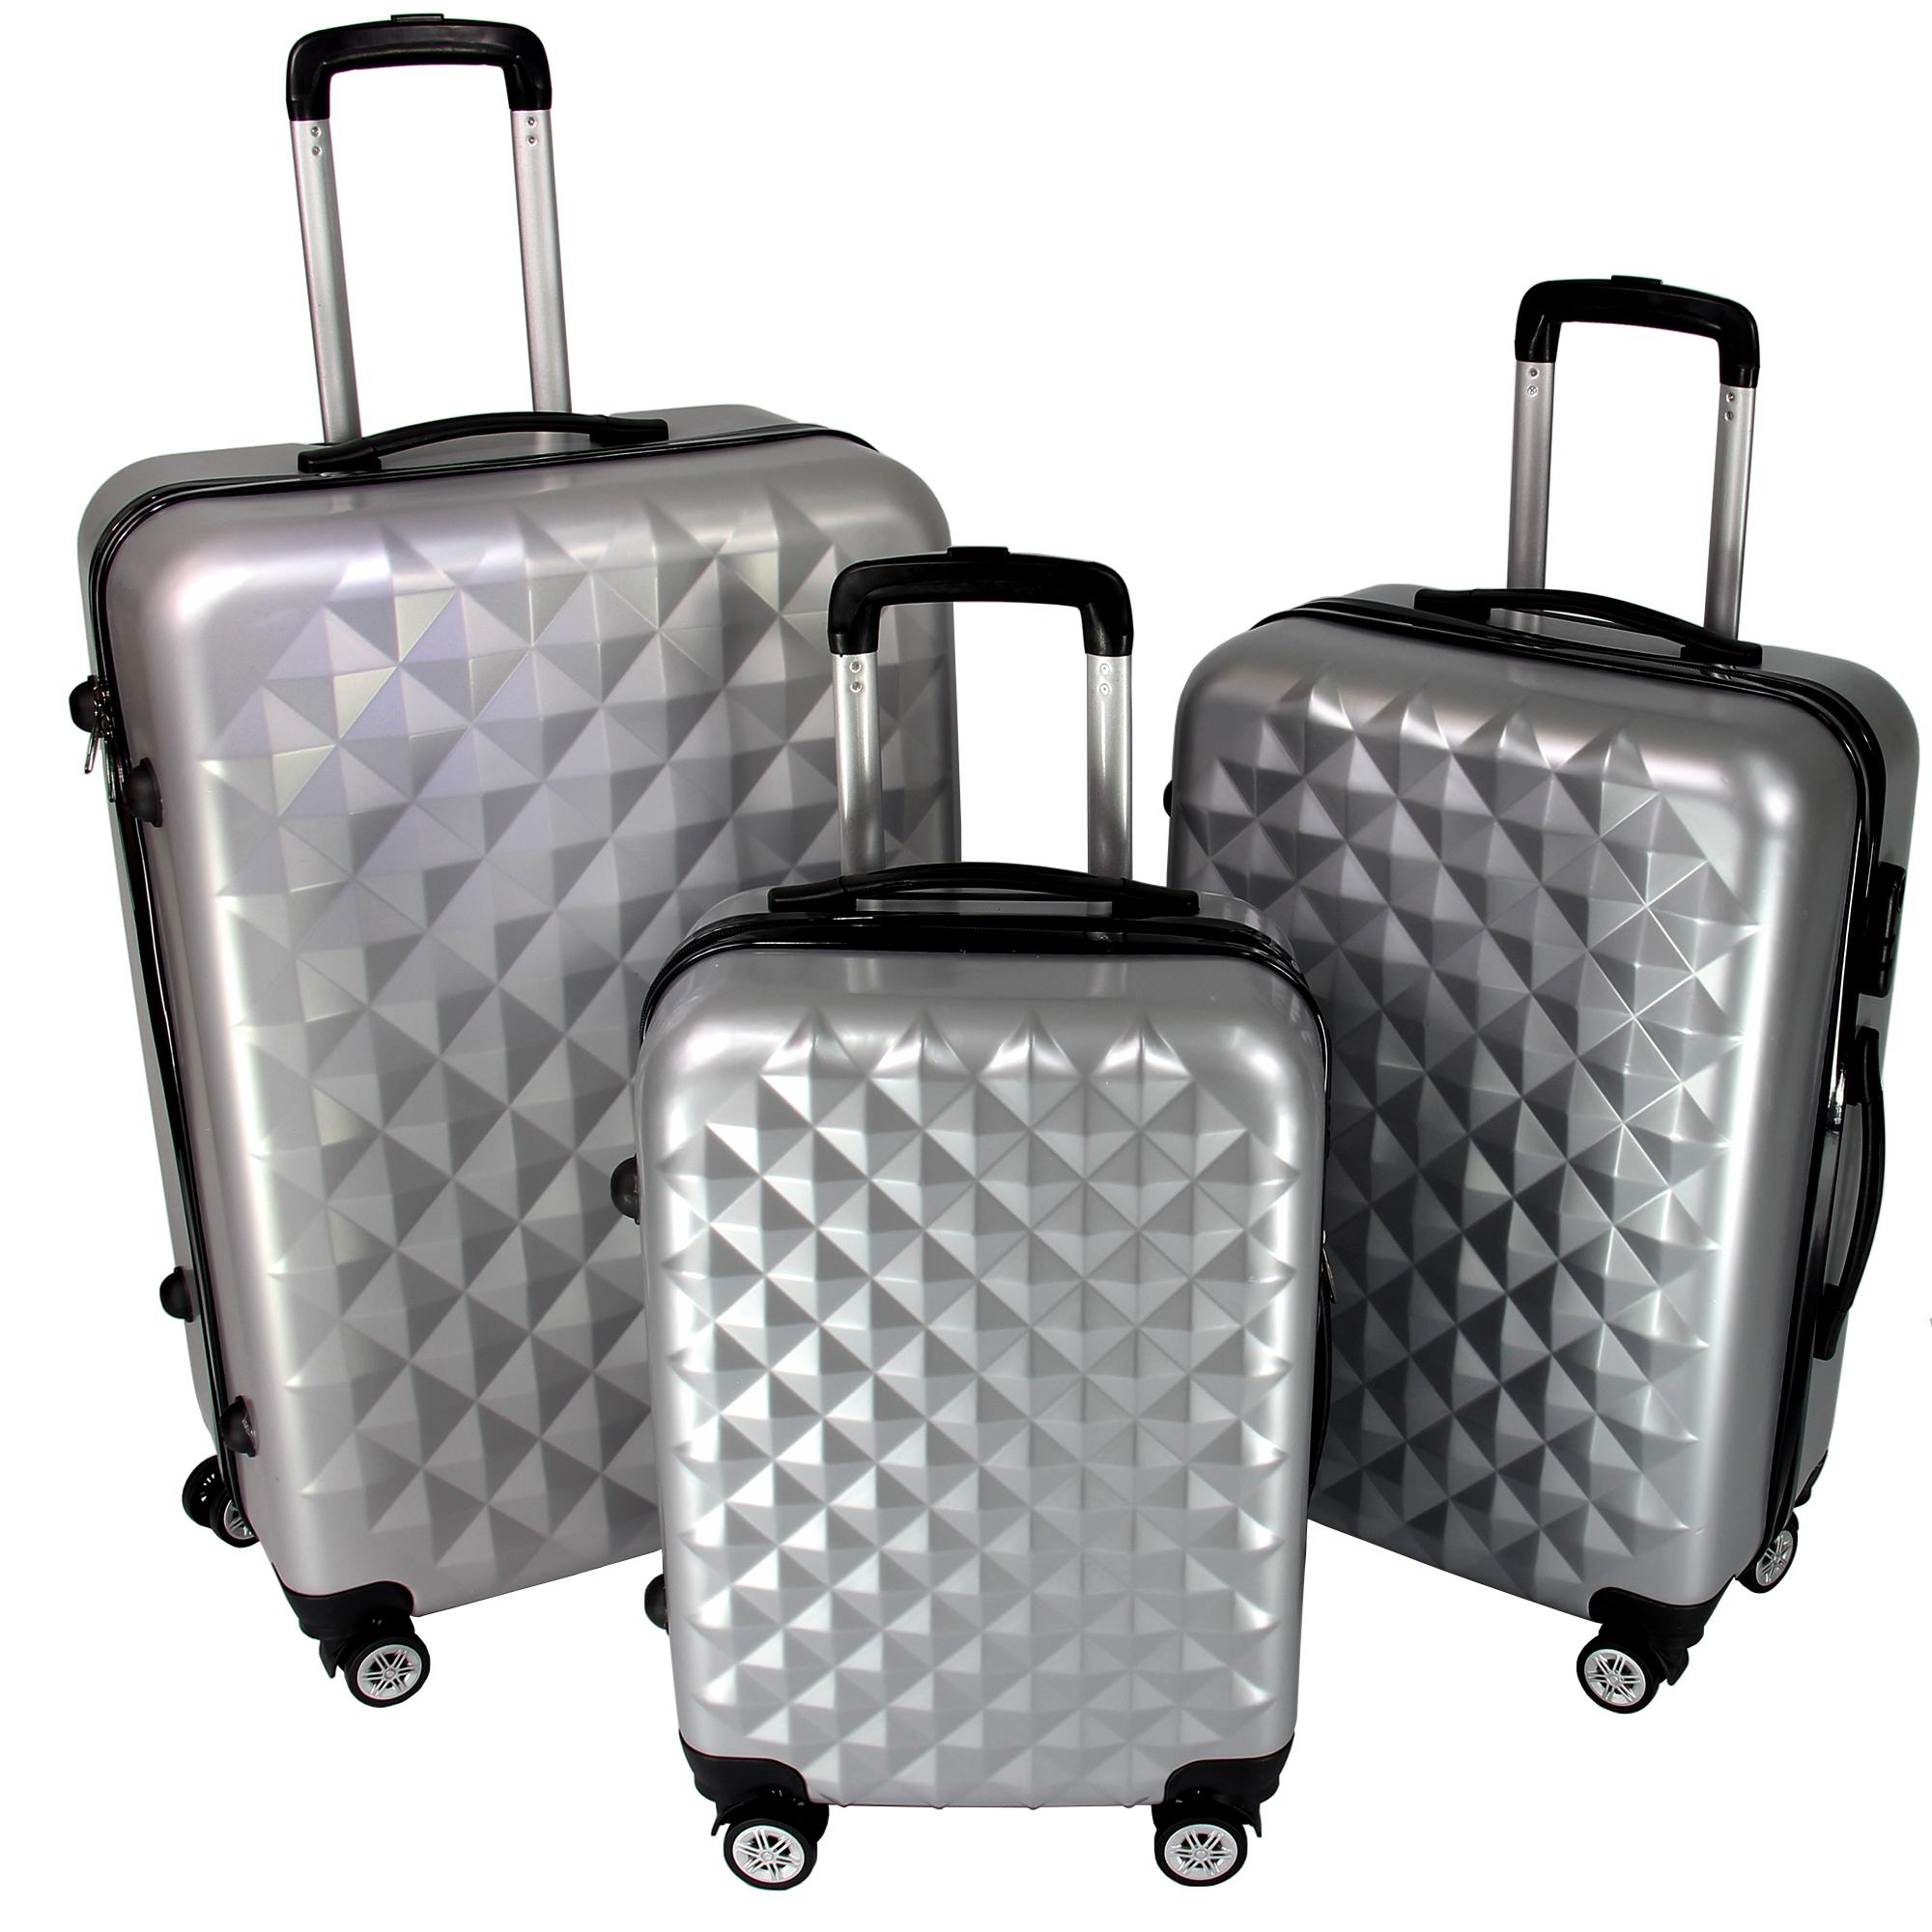 ensemble de valises valise de voyage chariot valise. Black Bedroom Furniture Sets. Home Design Ideas